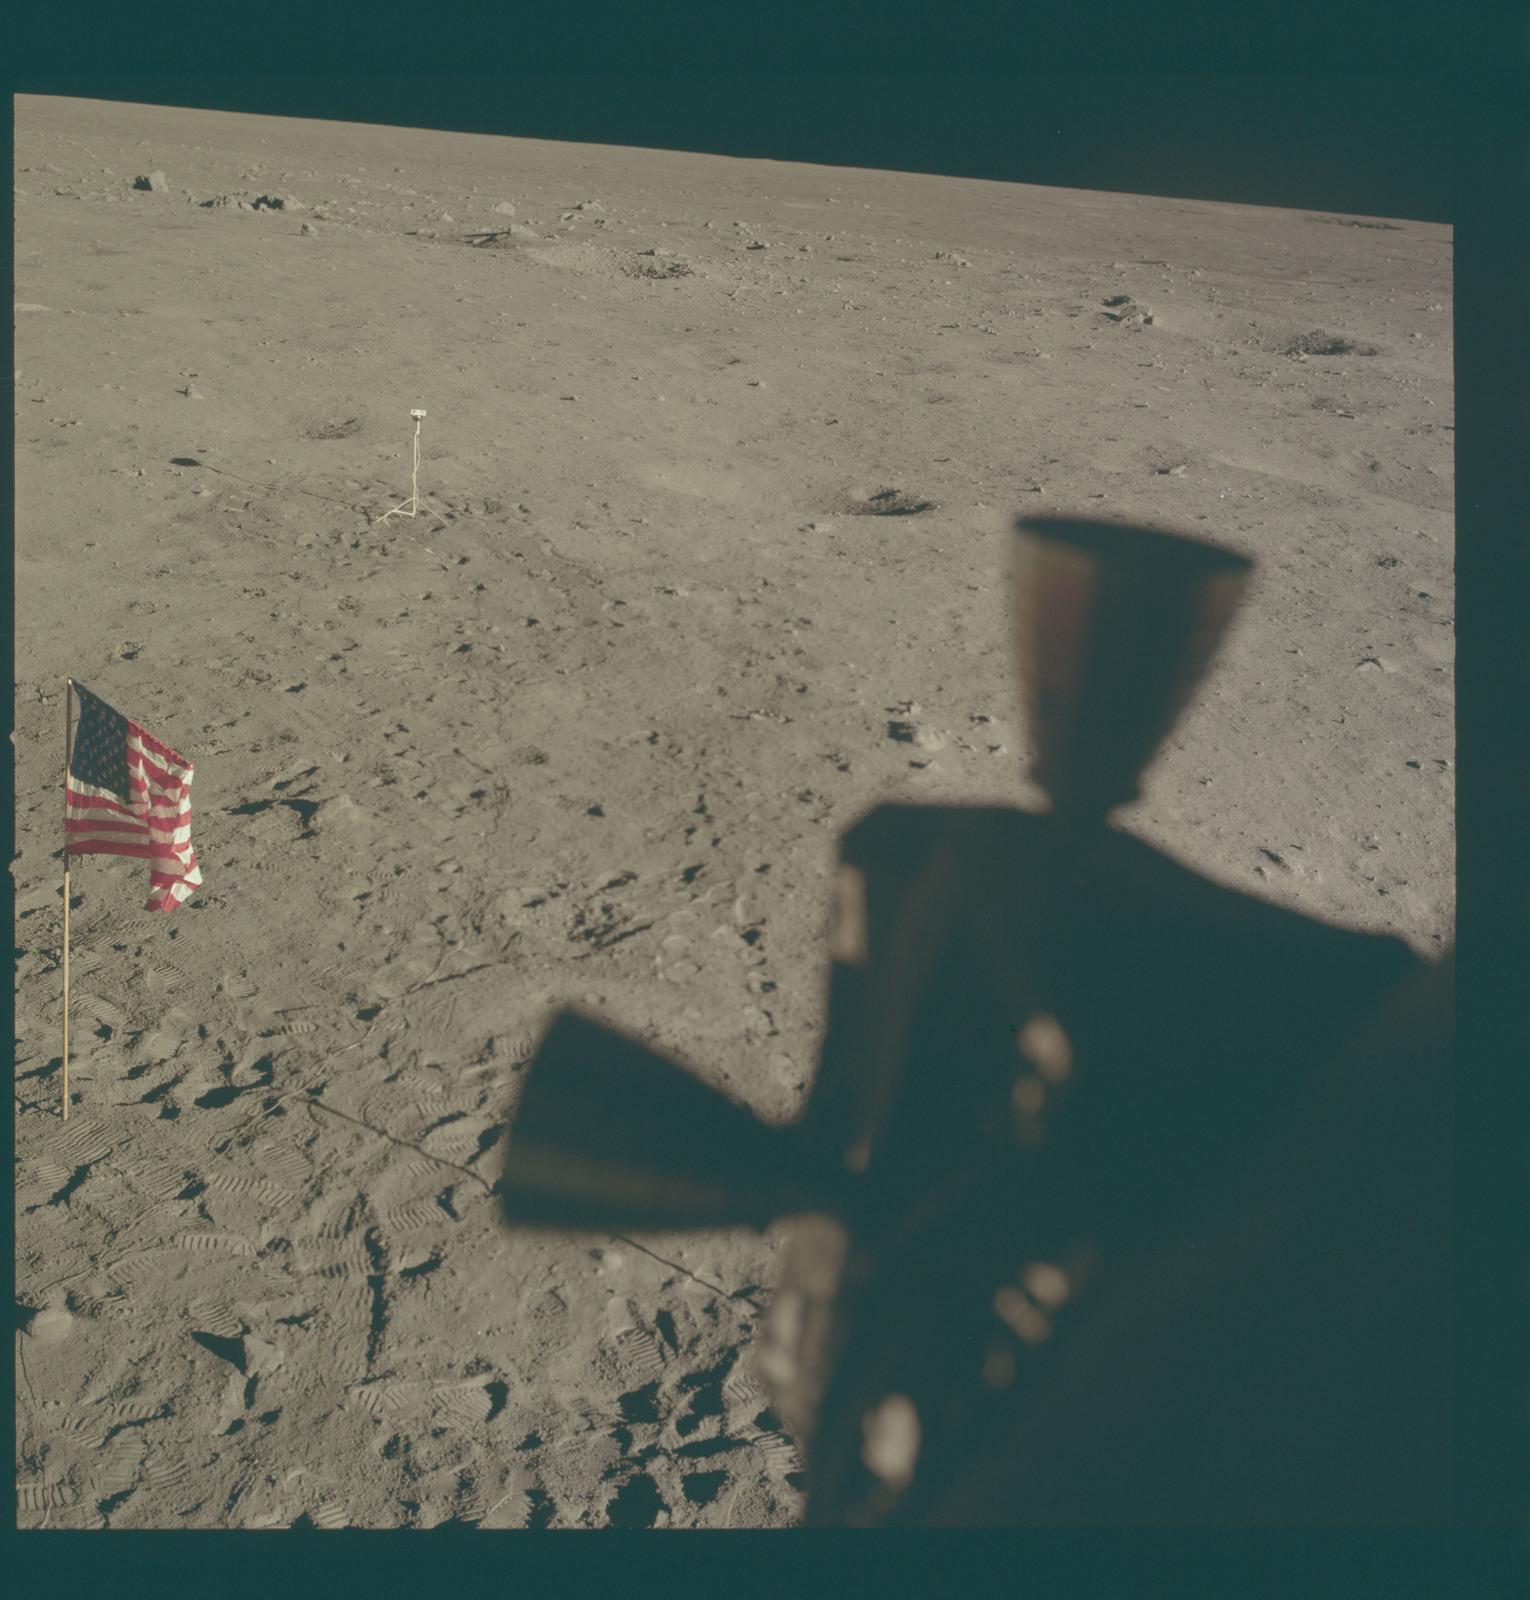 AS11-37-5468 - Apollo 11 - Apollo 11 Mission image - Lunar horizon from Tranquility Base